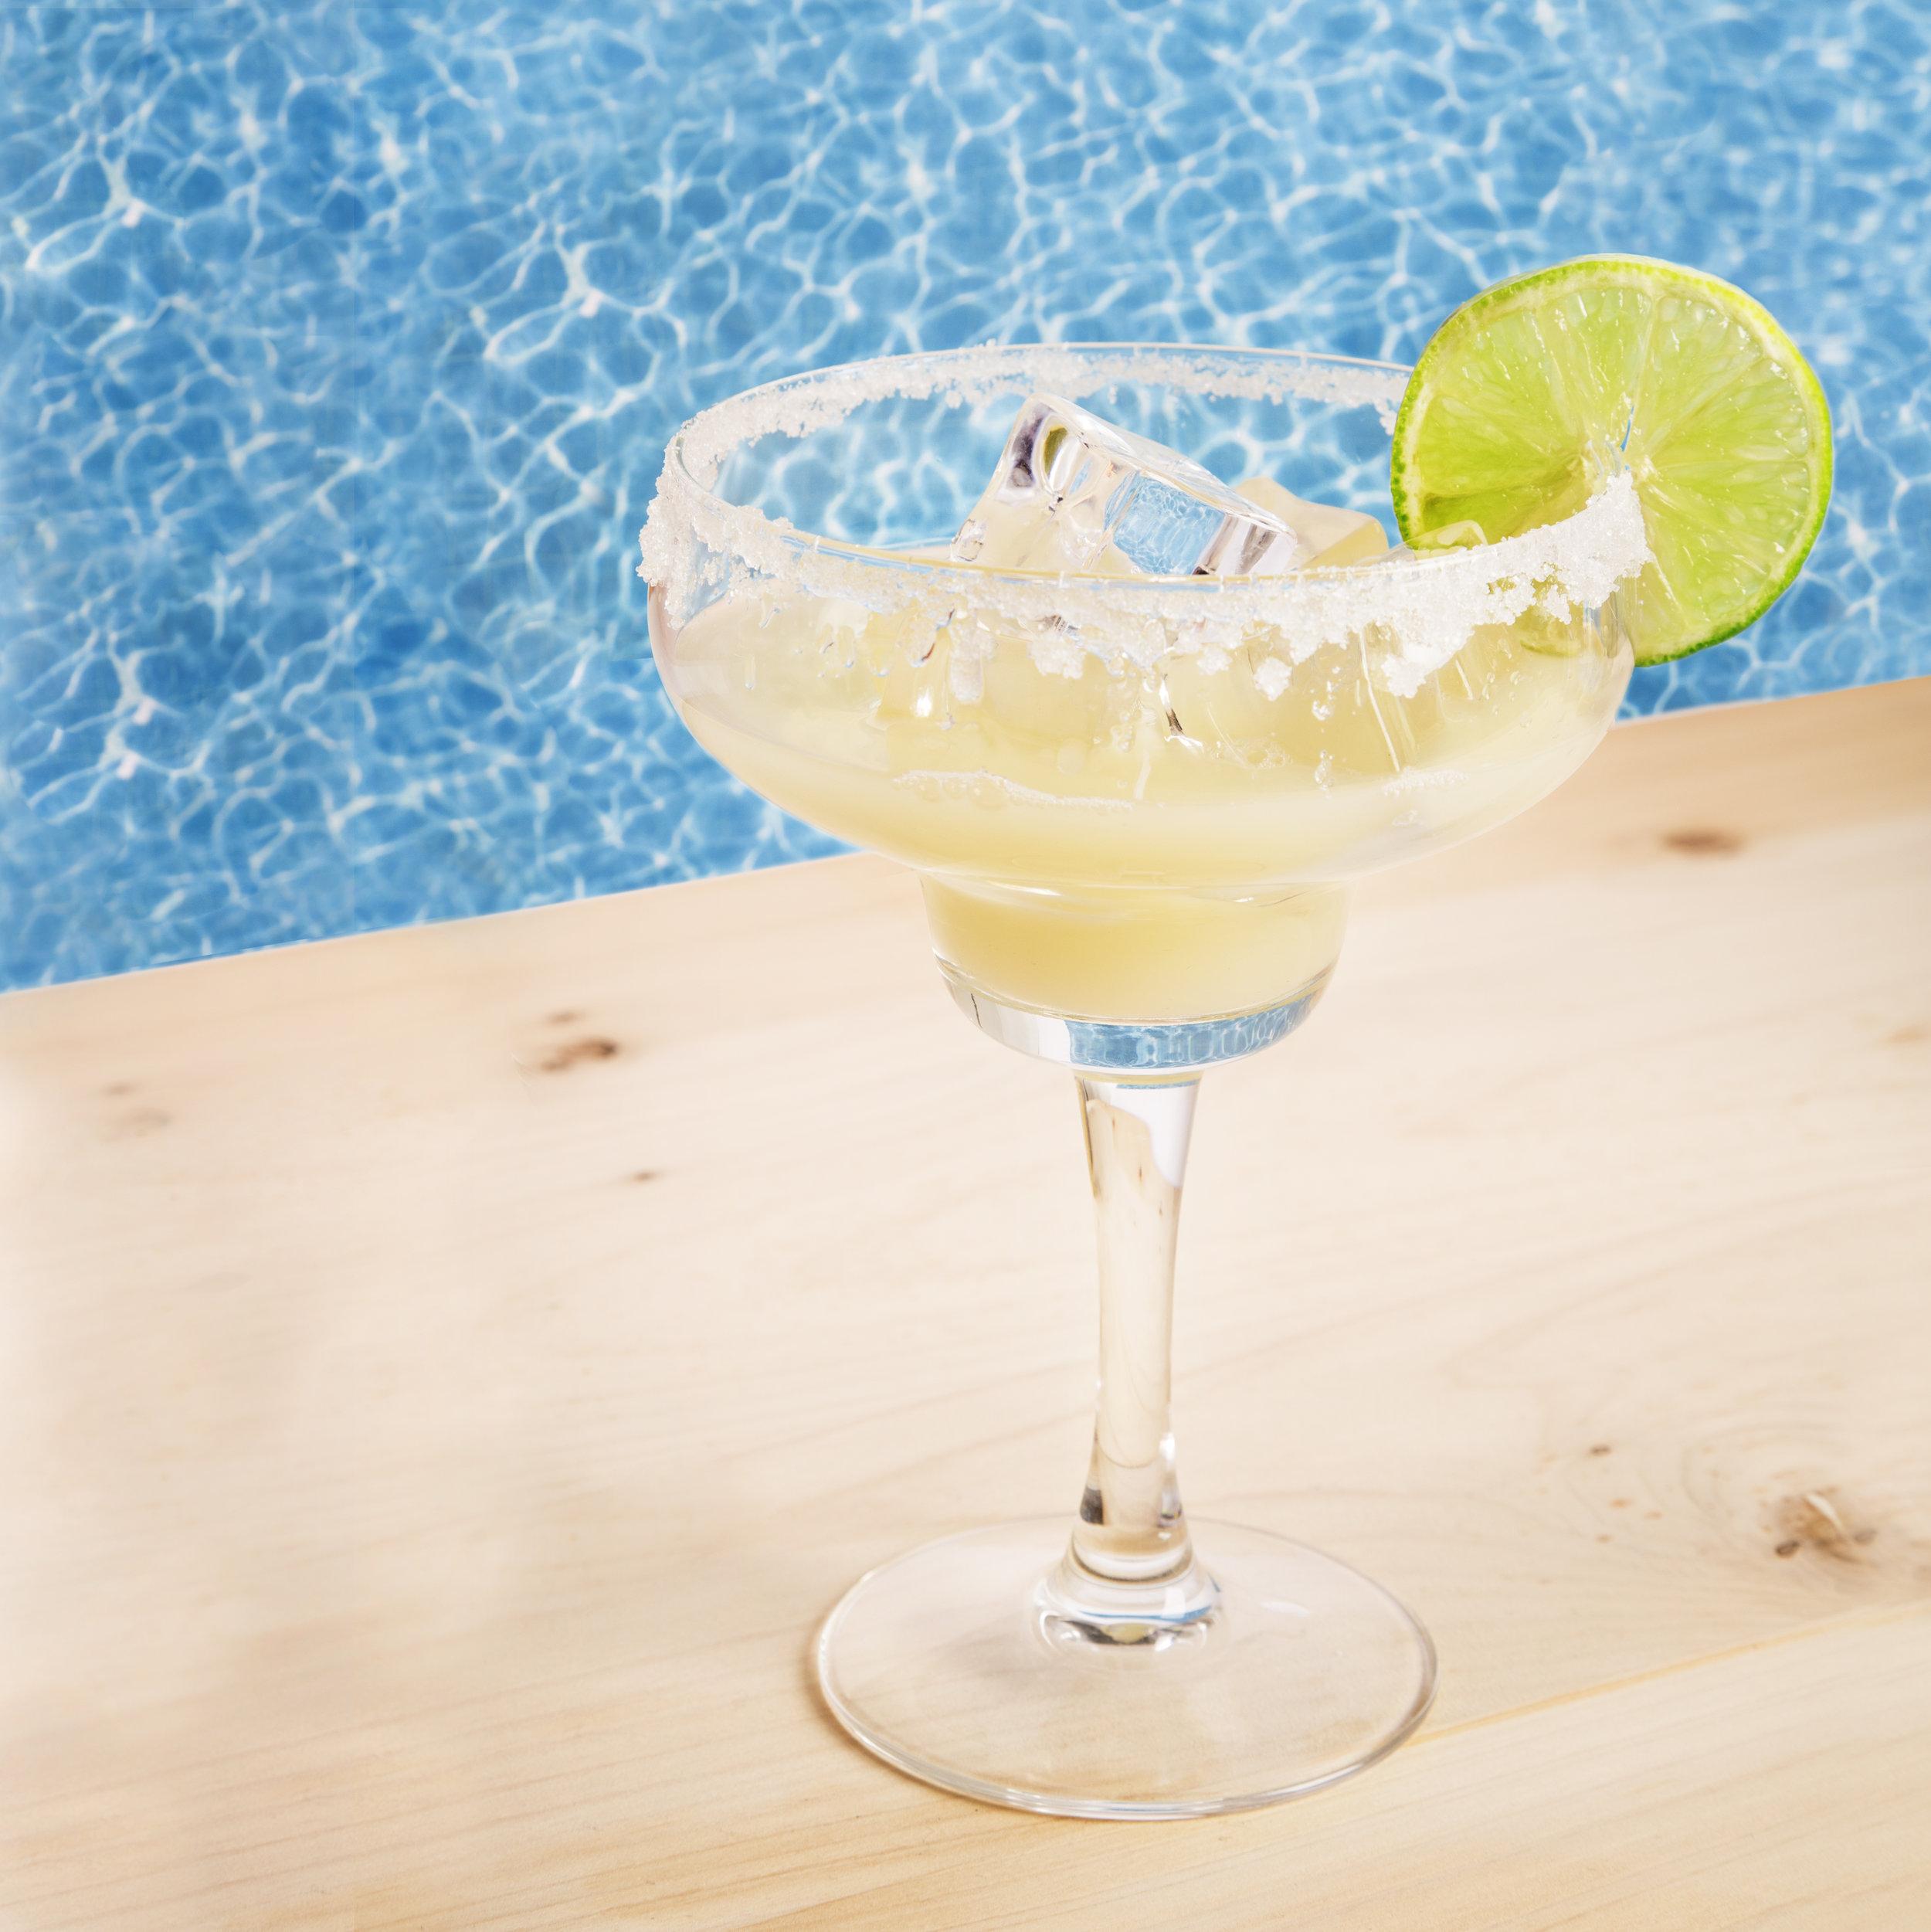 February 22nd - Margarita Day